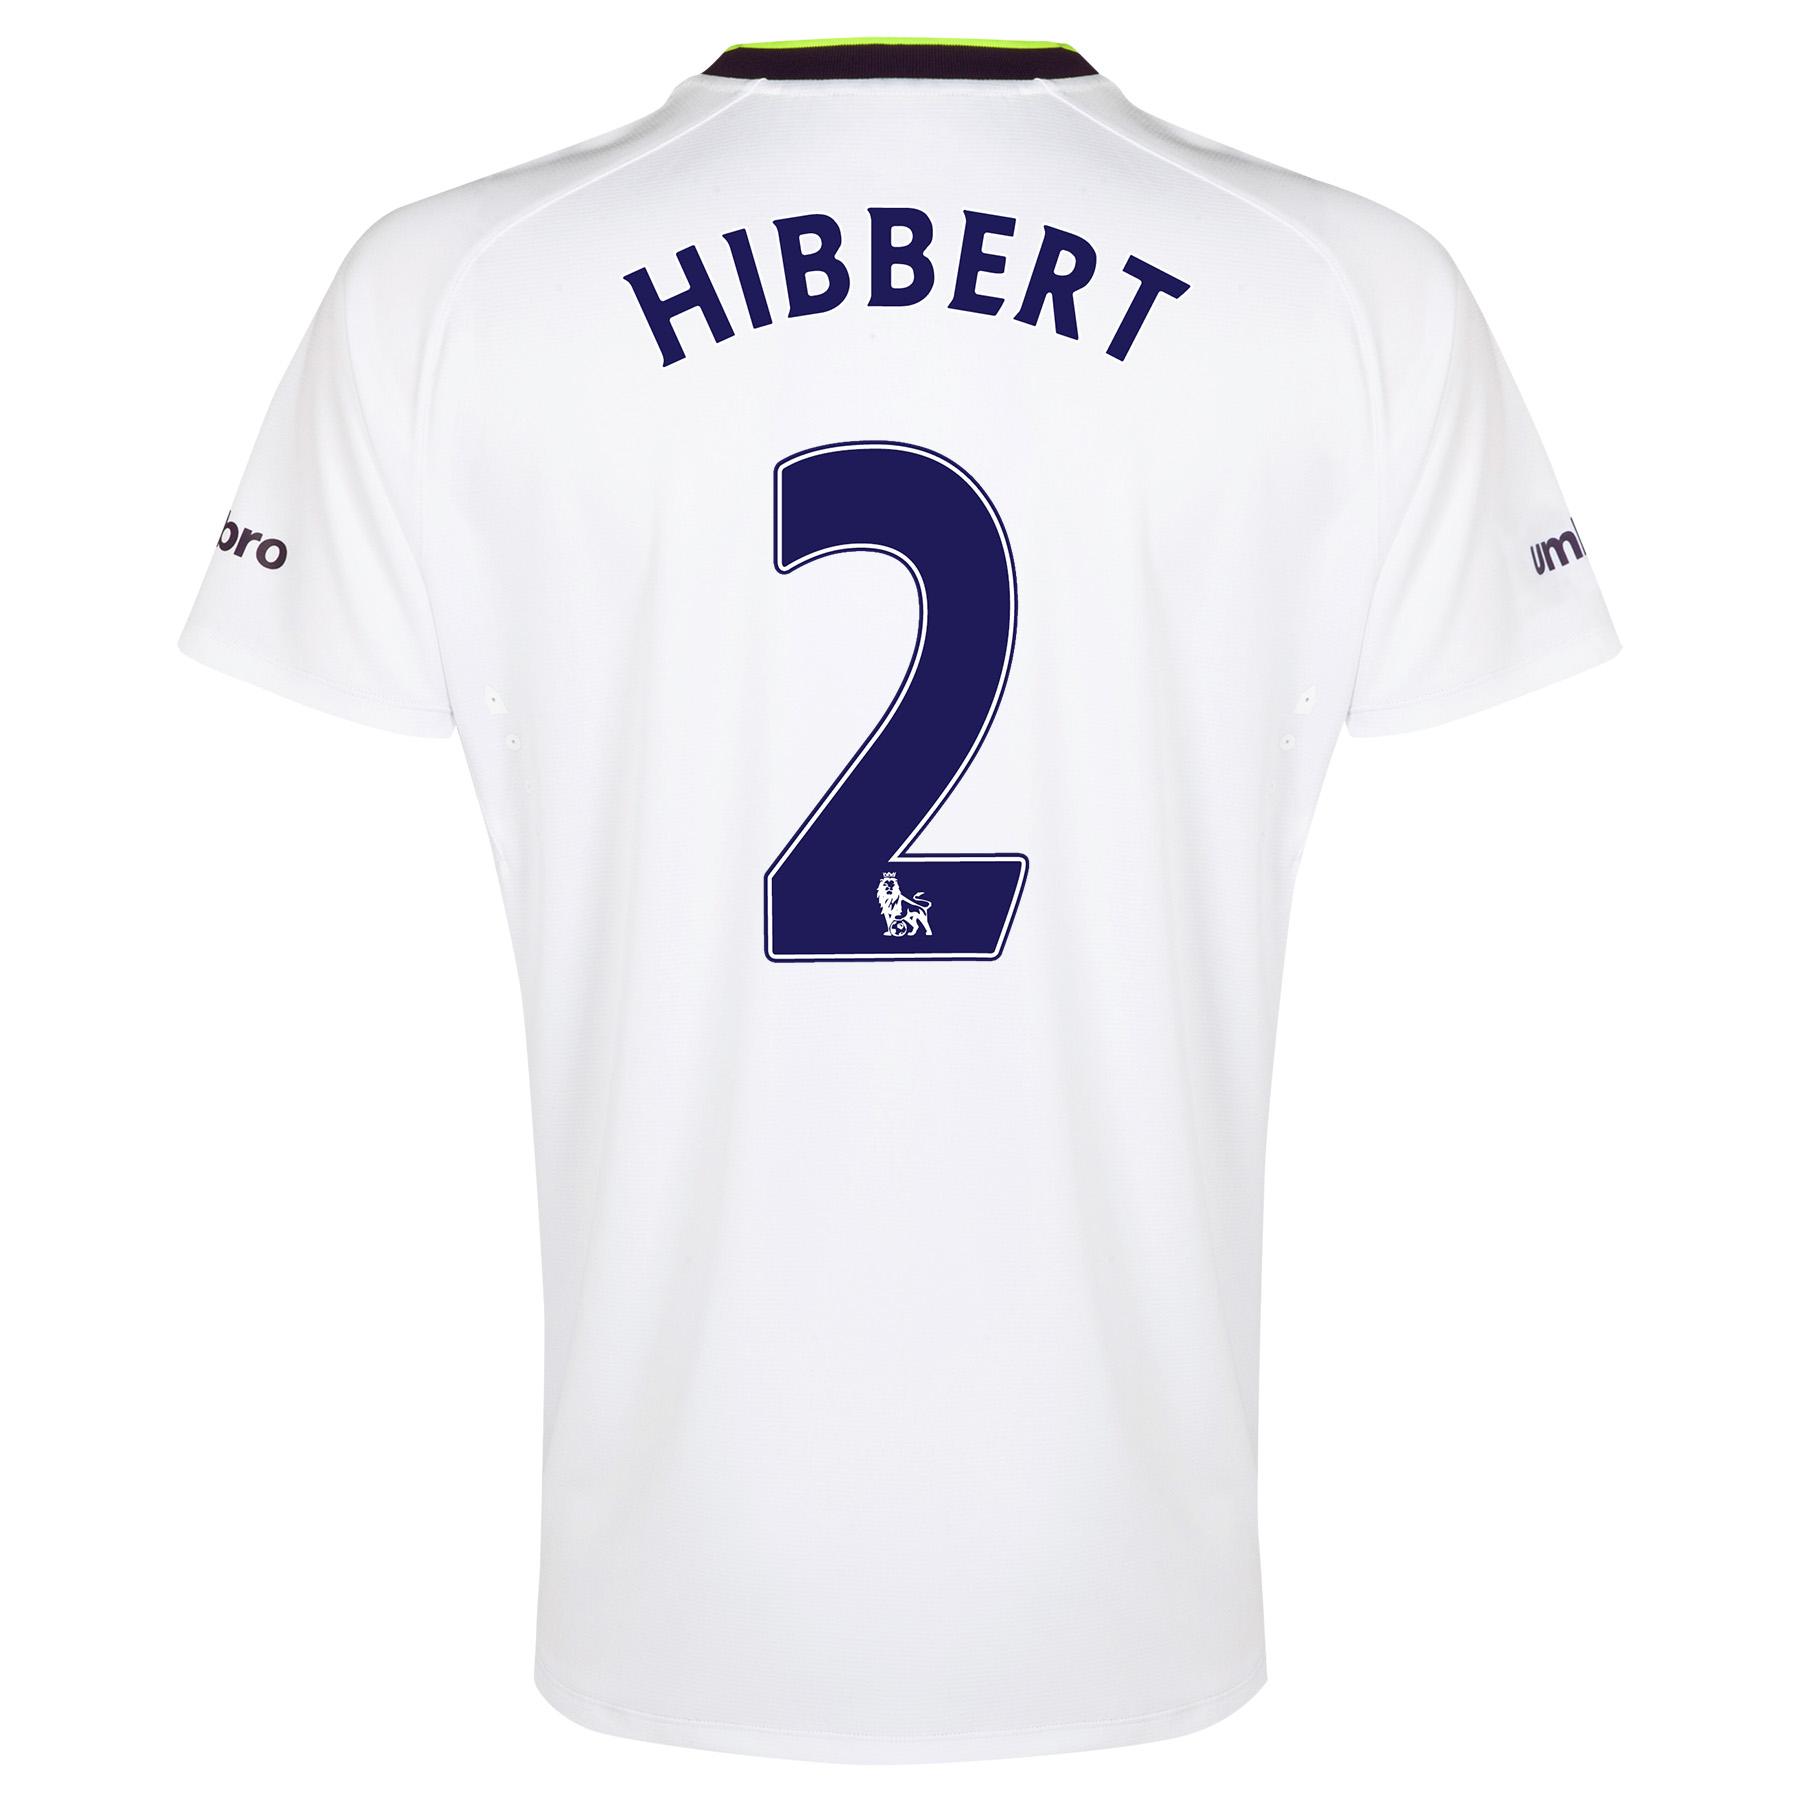 Everton SS 3rd Shirt  2014/15 with Hibbert 2 printing